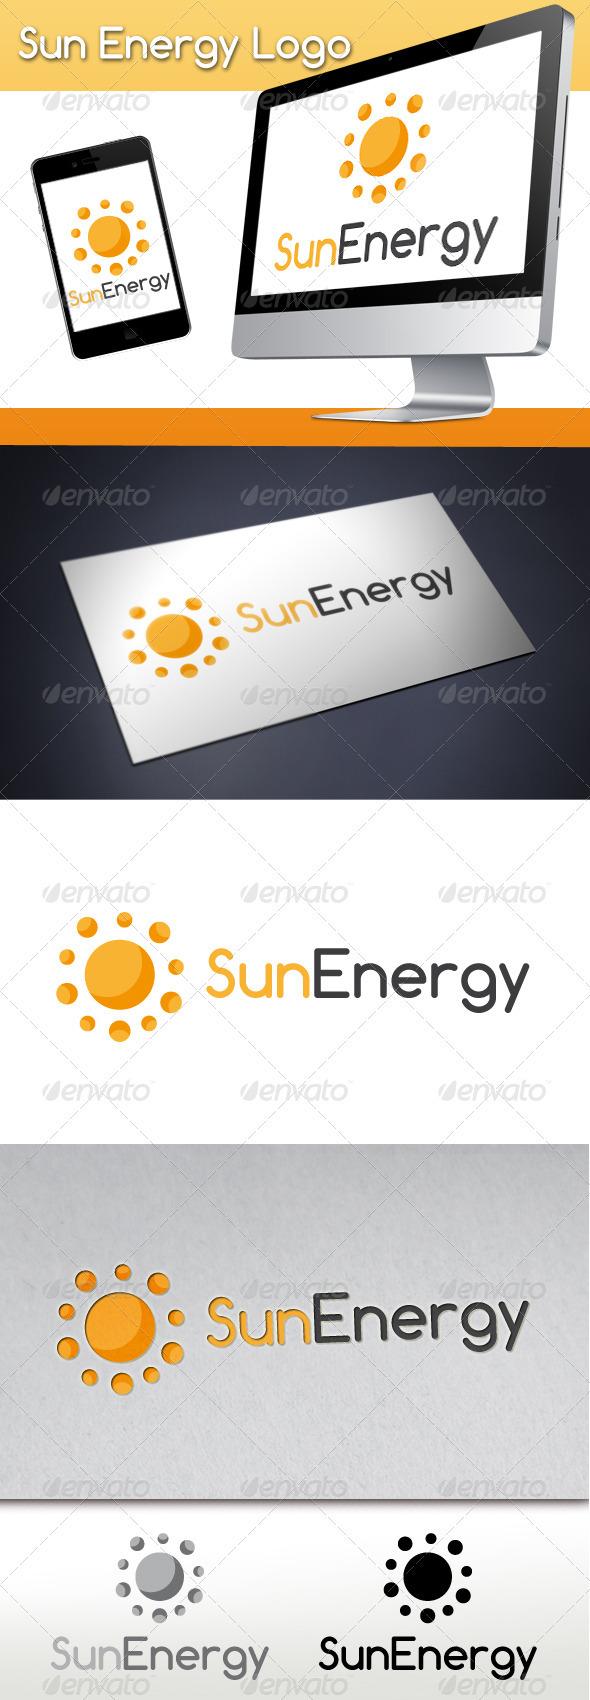 GraphicRiver Sun Energy Logo 3279006